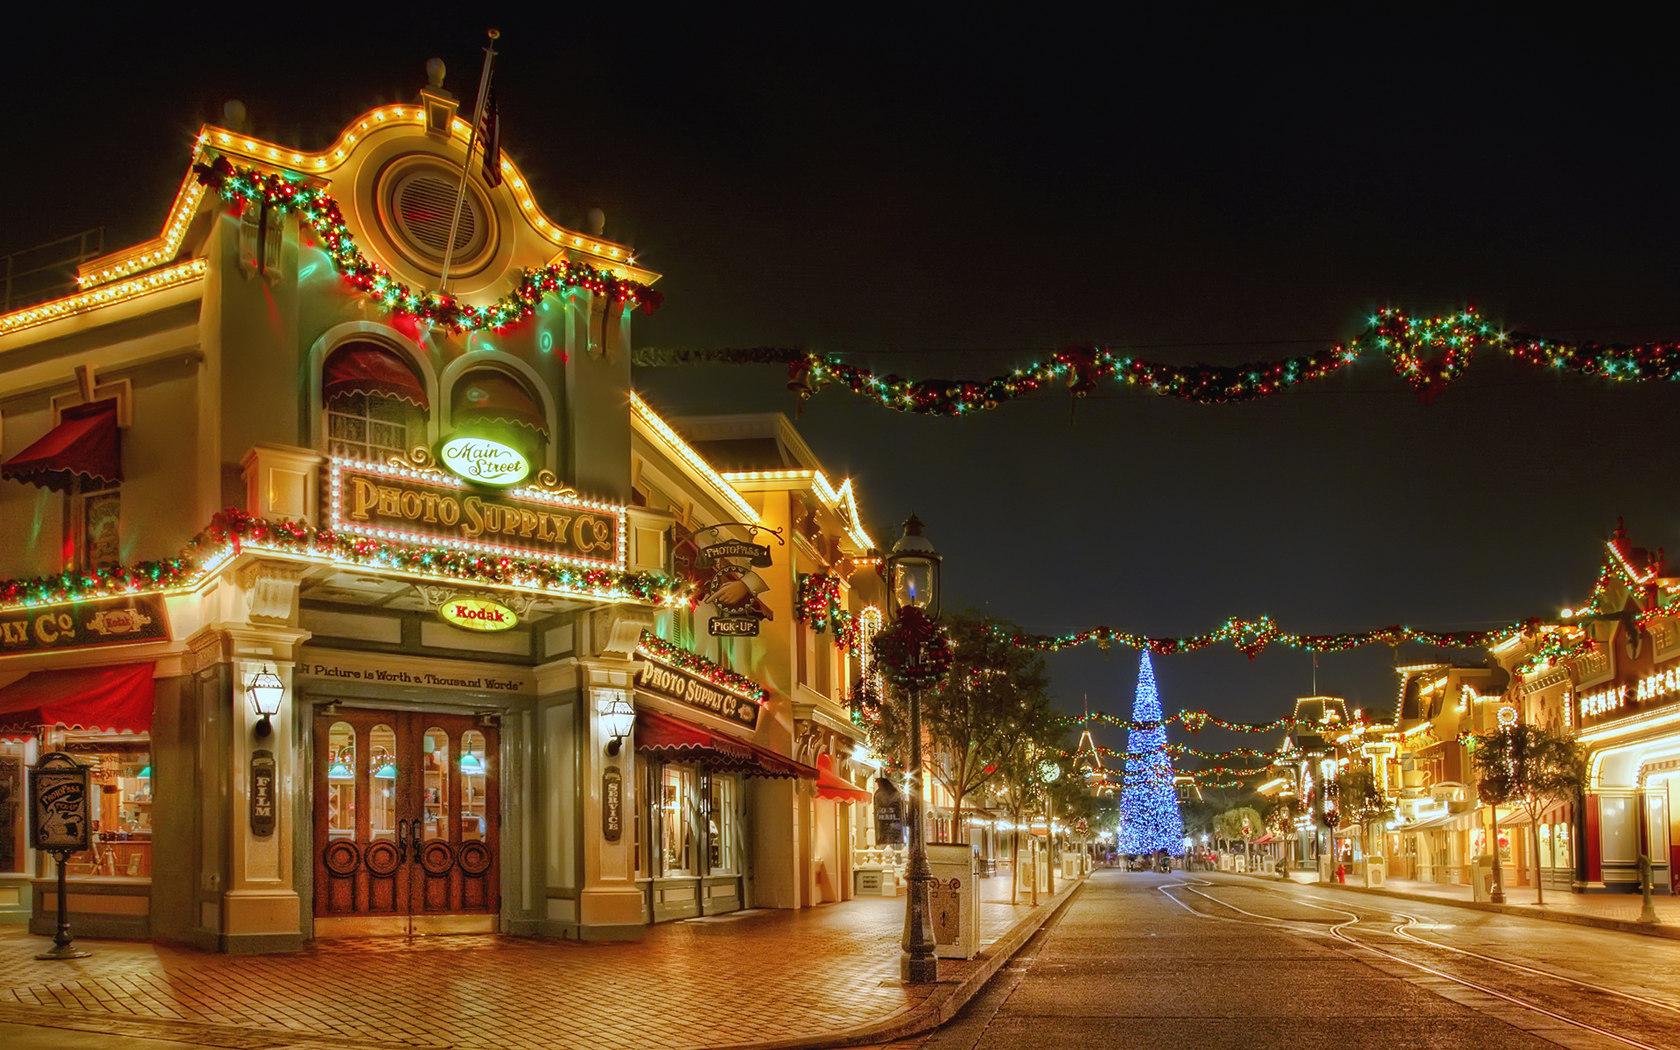 Disneyland Christmas Desktop Backgrounds , HD Wallpaper & Backgrounds